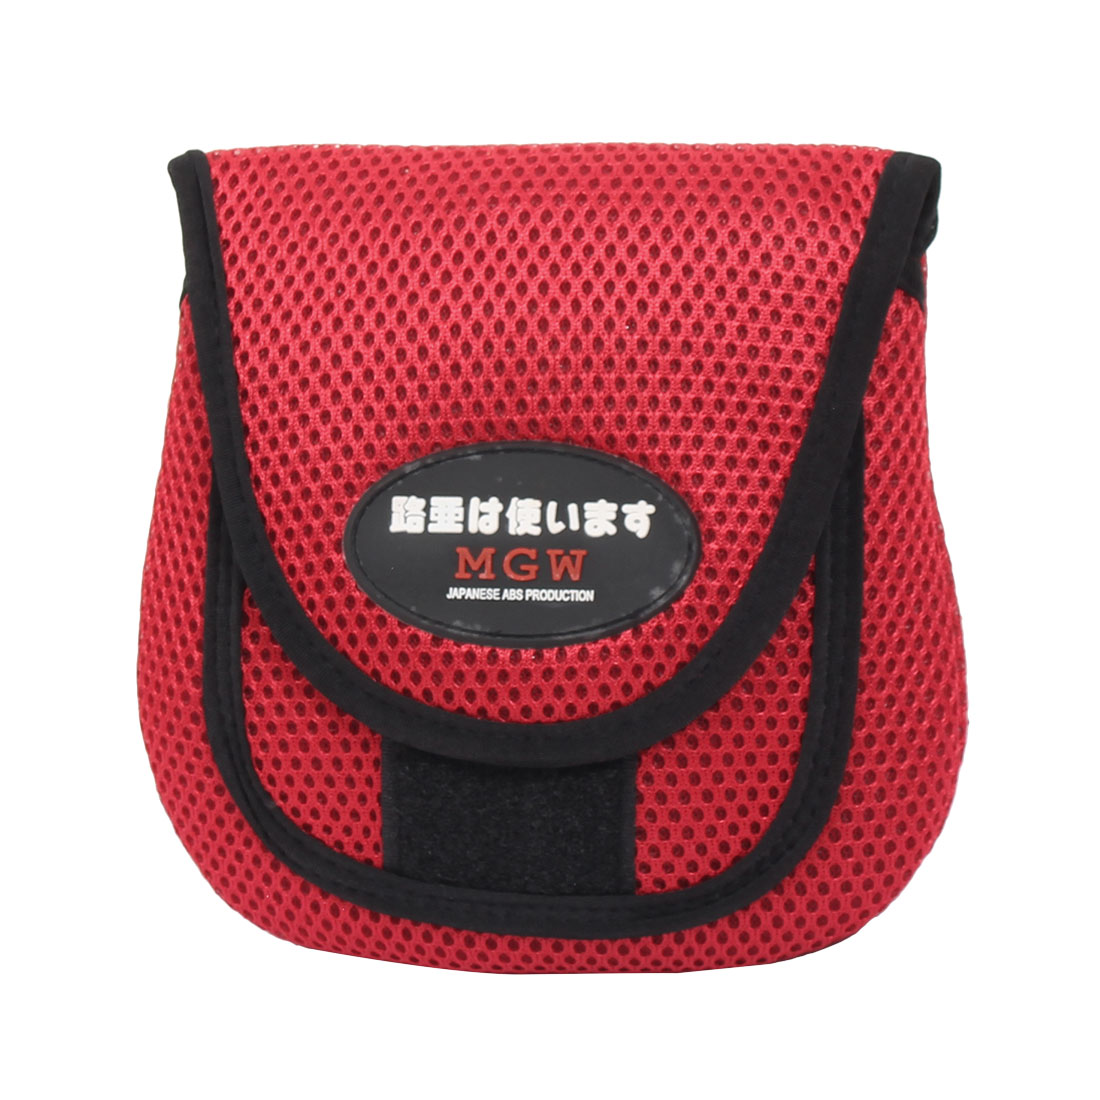 Hook Loop Closure Mesh Fishing Reel Cover Pouch Bag Red